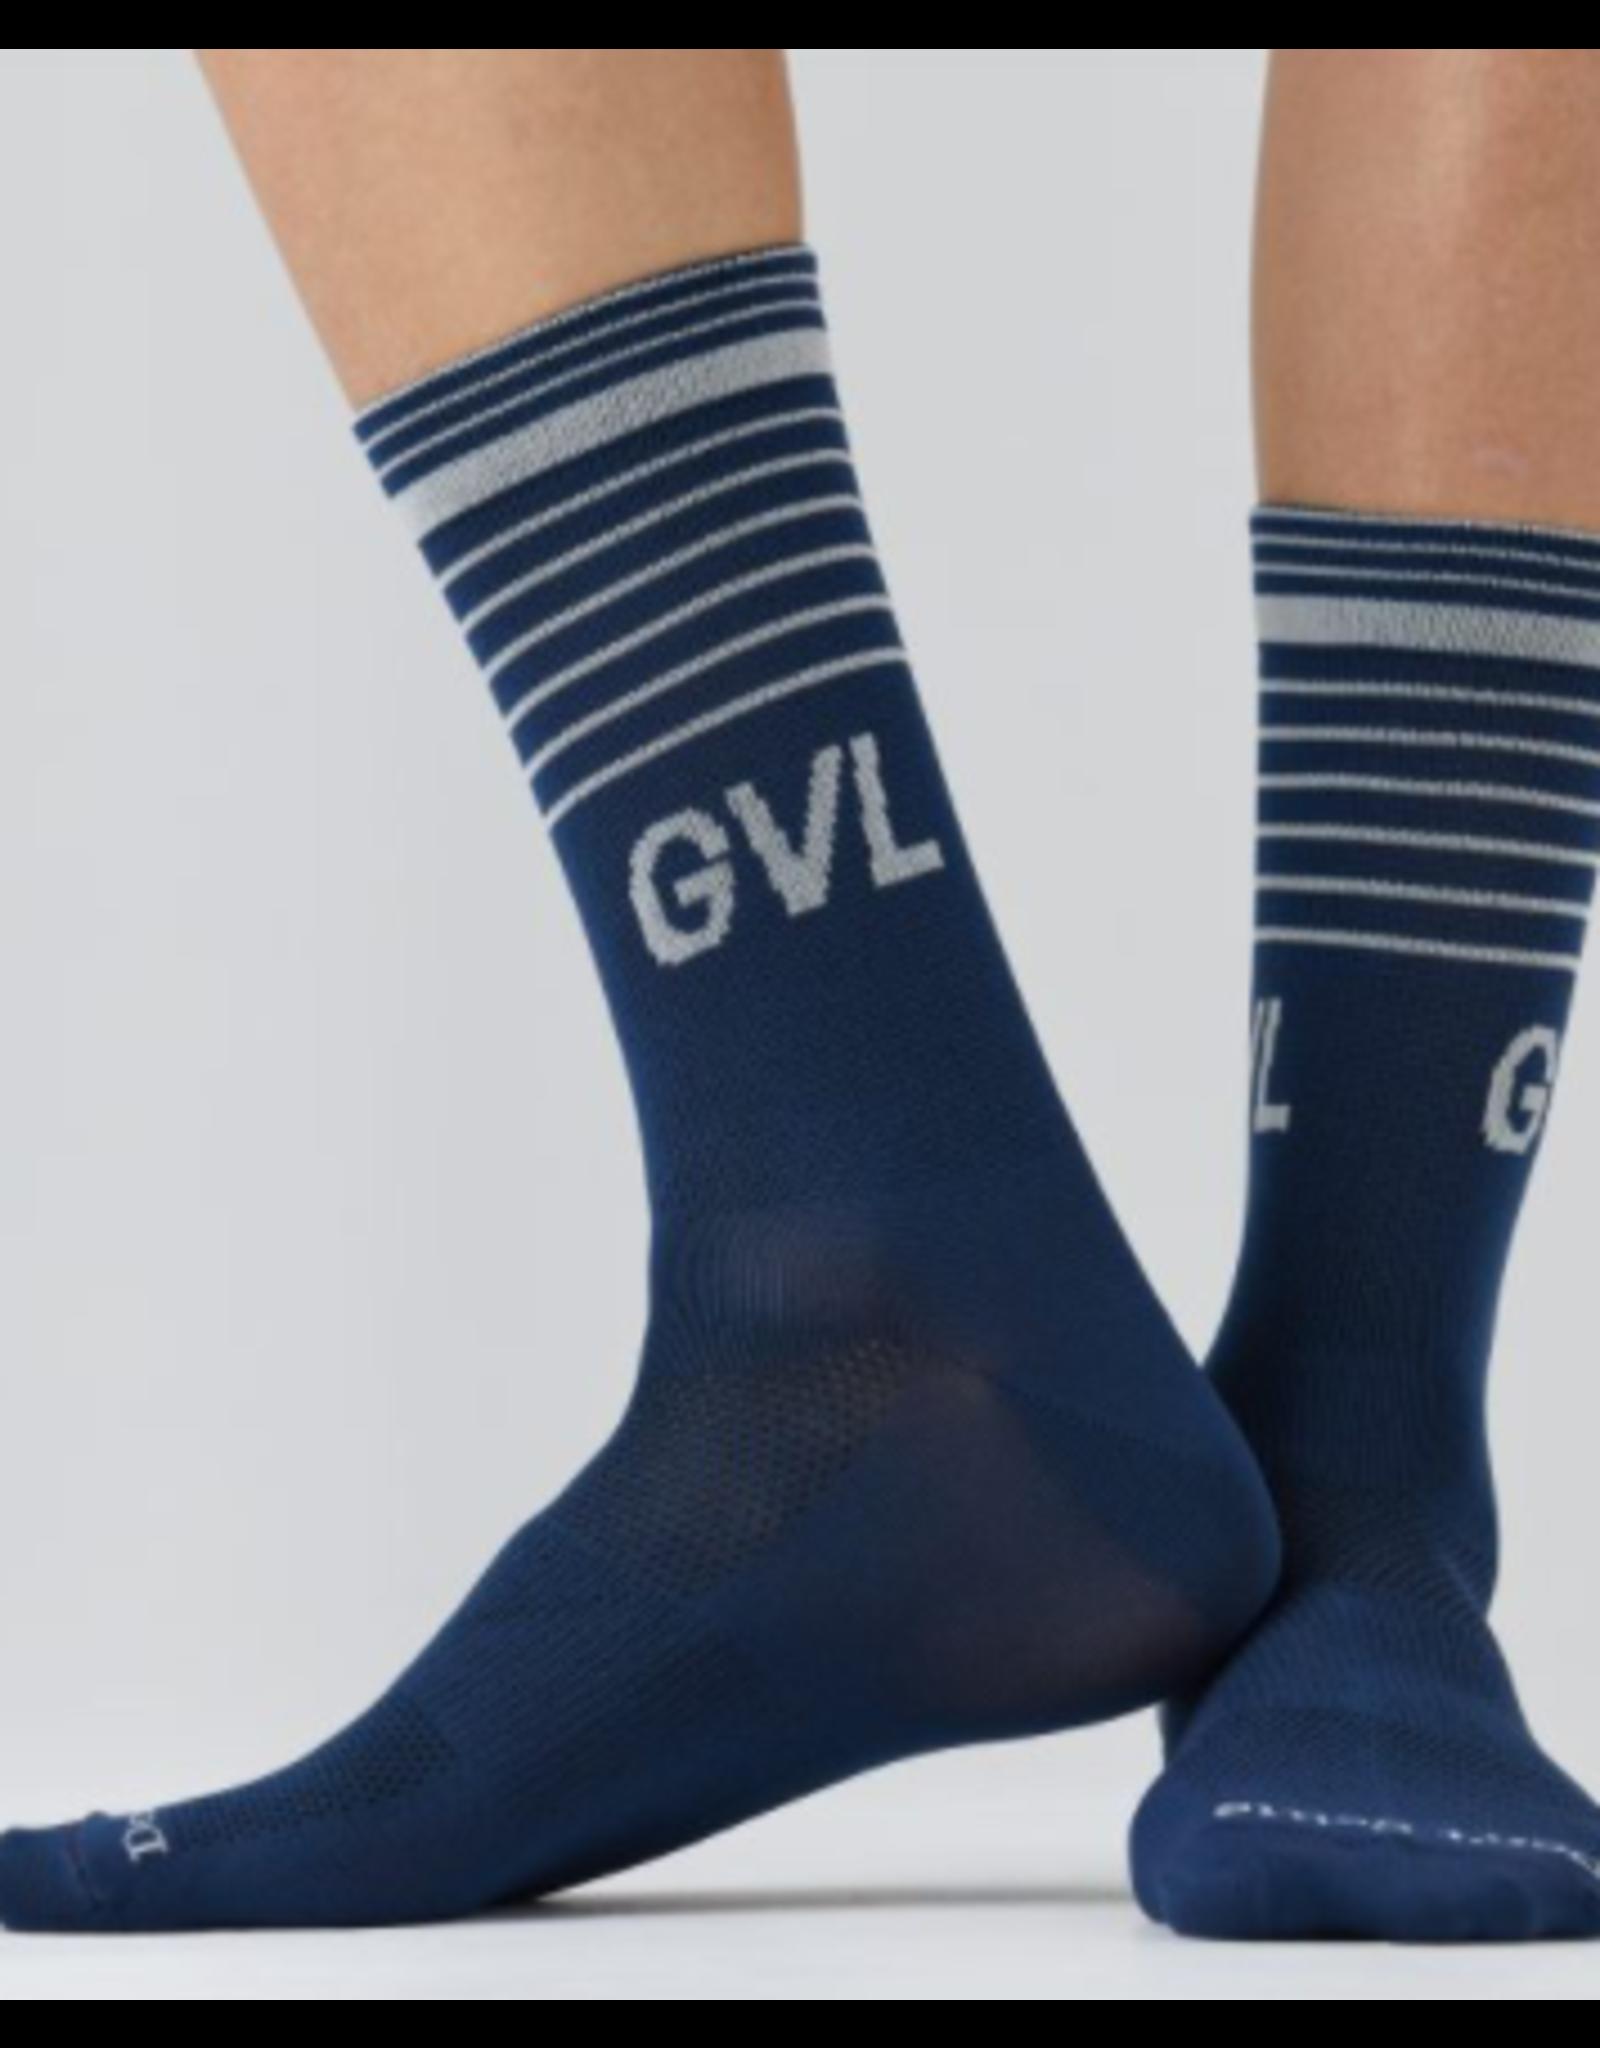 Givelo G-Socks Blue Stripped Unisex